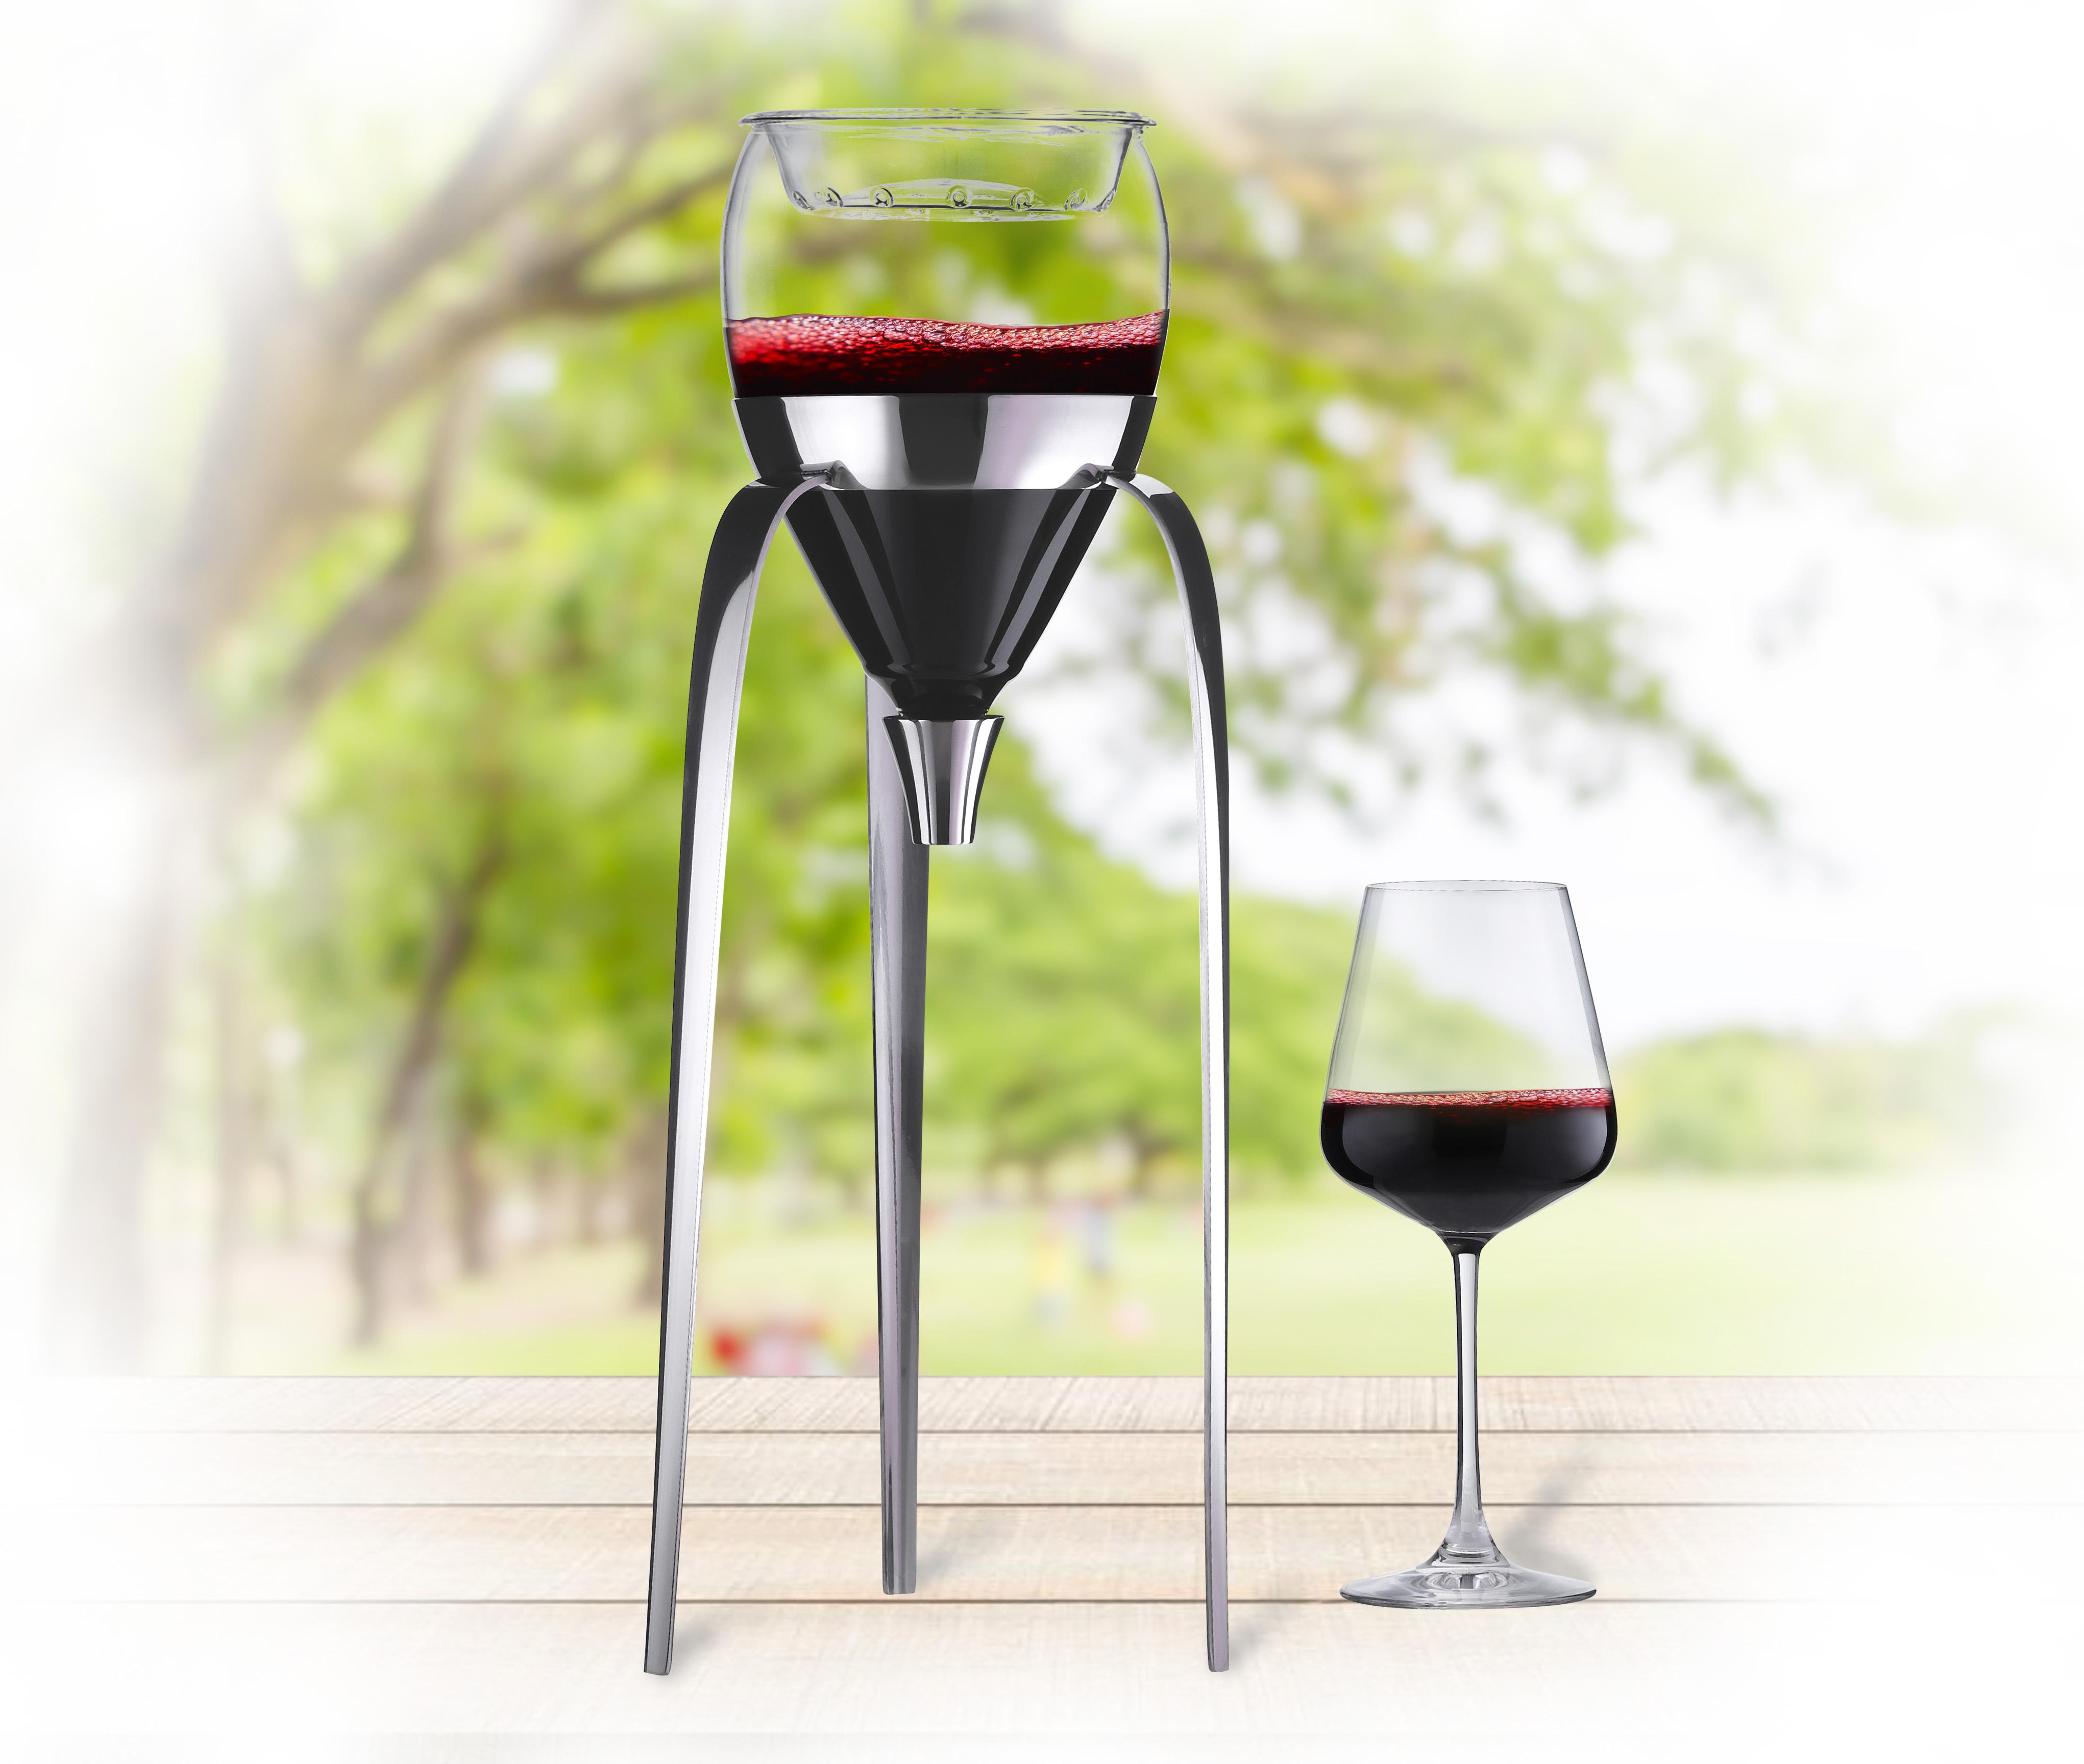 Vortex Somm and glass